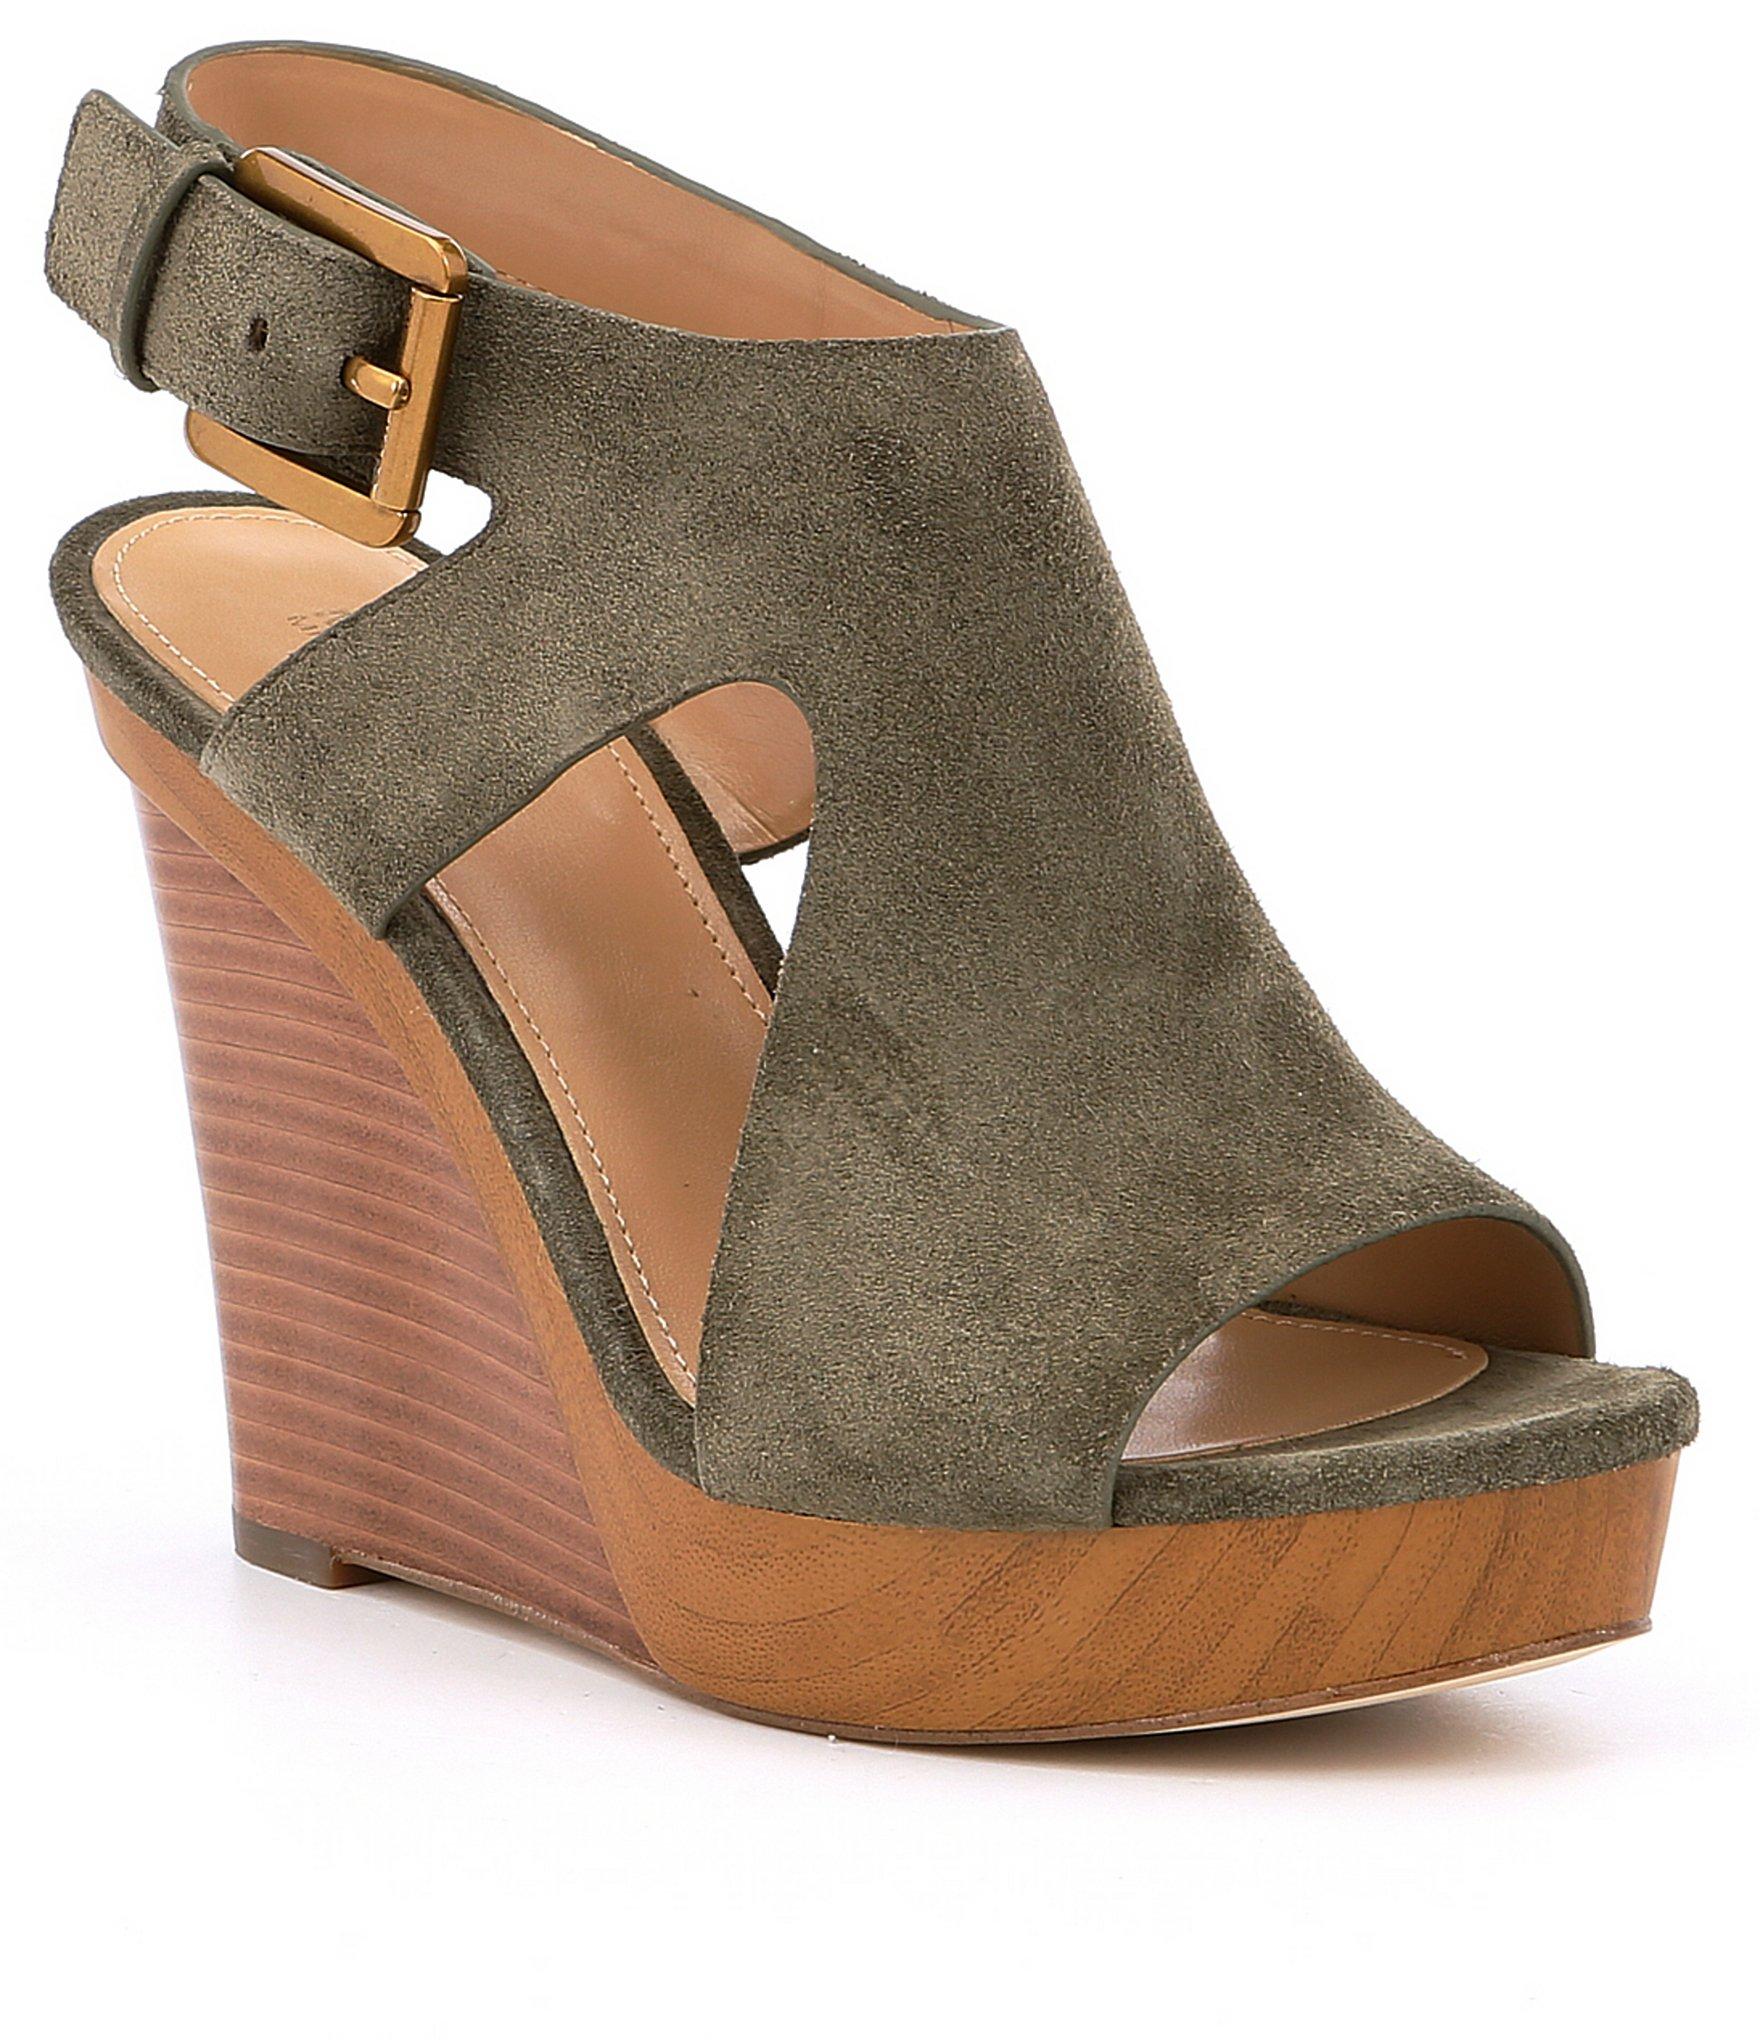 wedges shoes shoes | womenu0027s shoes | wedges | dillards.com oynkdss